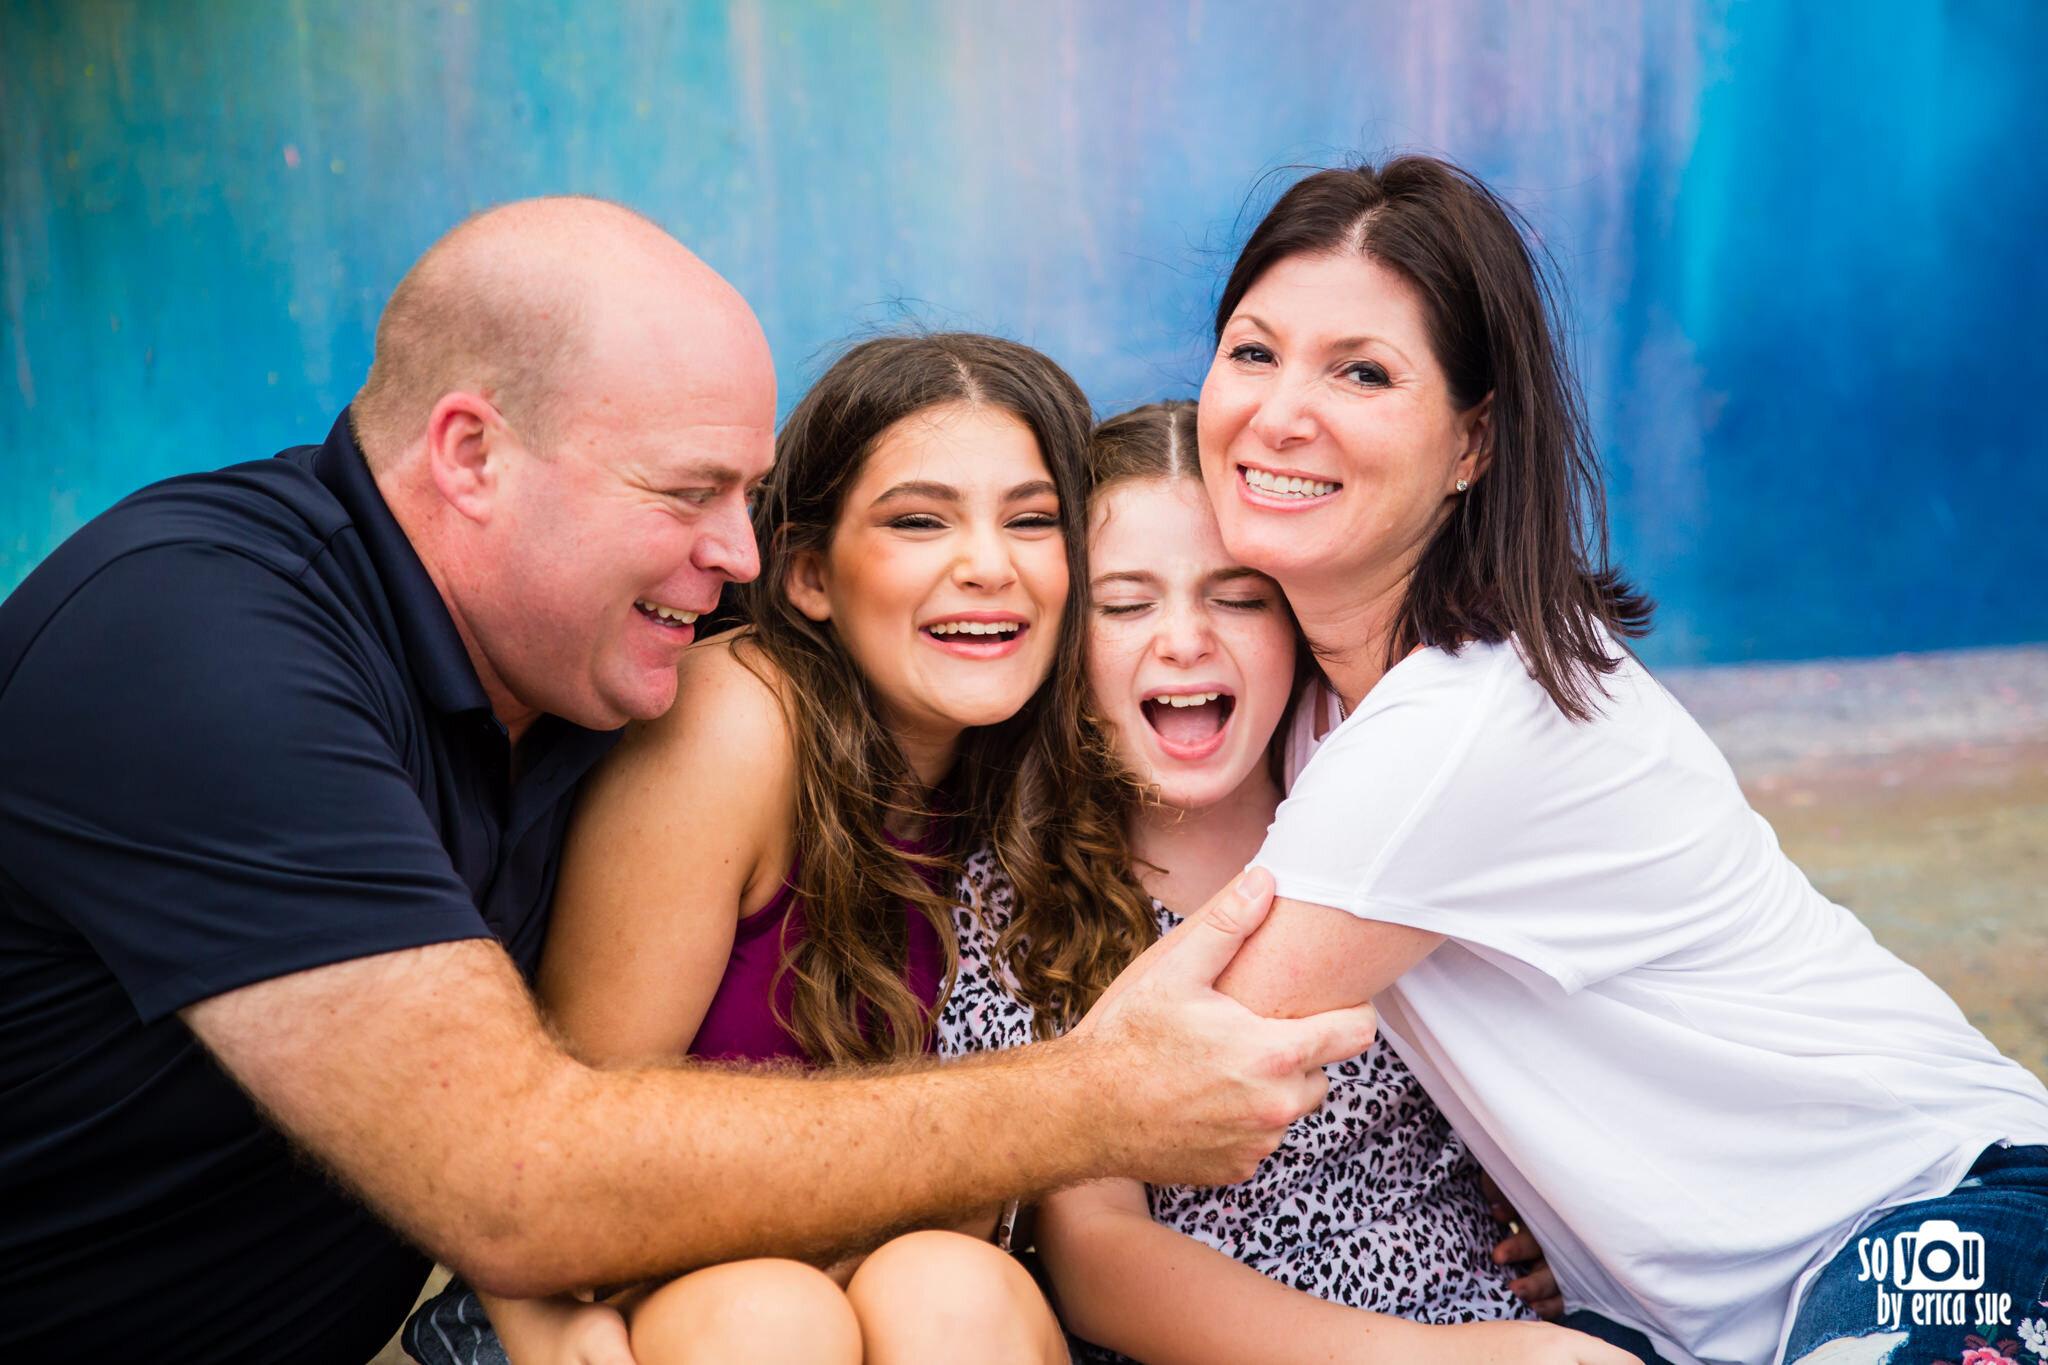 so-you-by-erica-sue-wynwood-miami-lifestyle-family-photographer-mitzvah-pre-shoot-0048.JPG